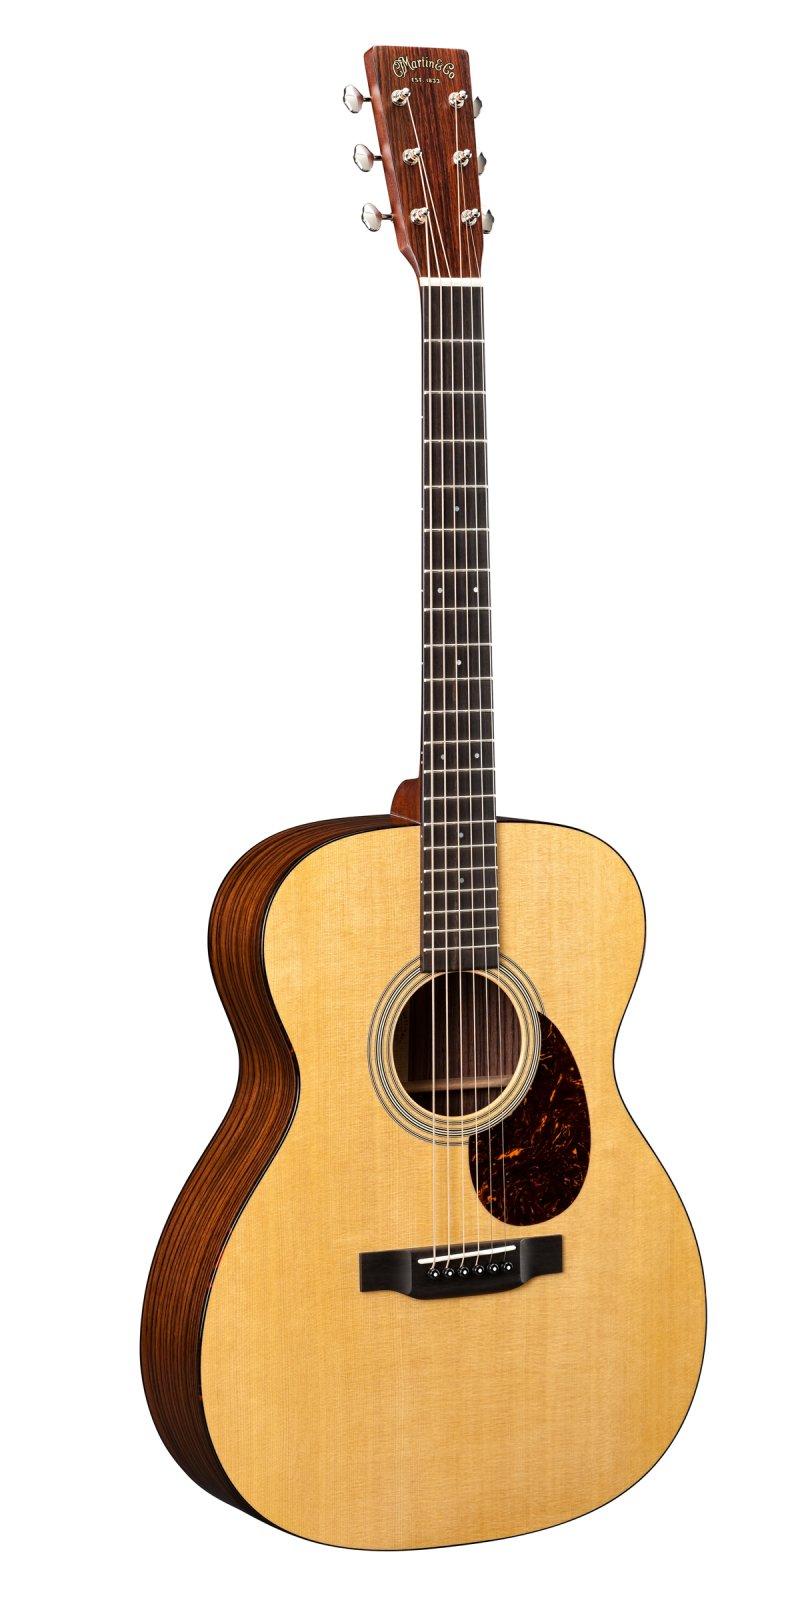 Martin OM-21Acoustic Guitar - Natural